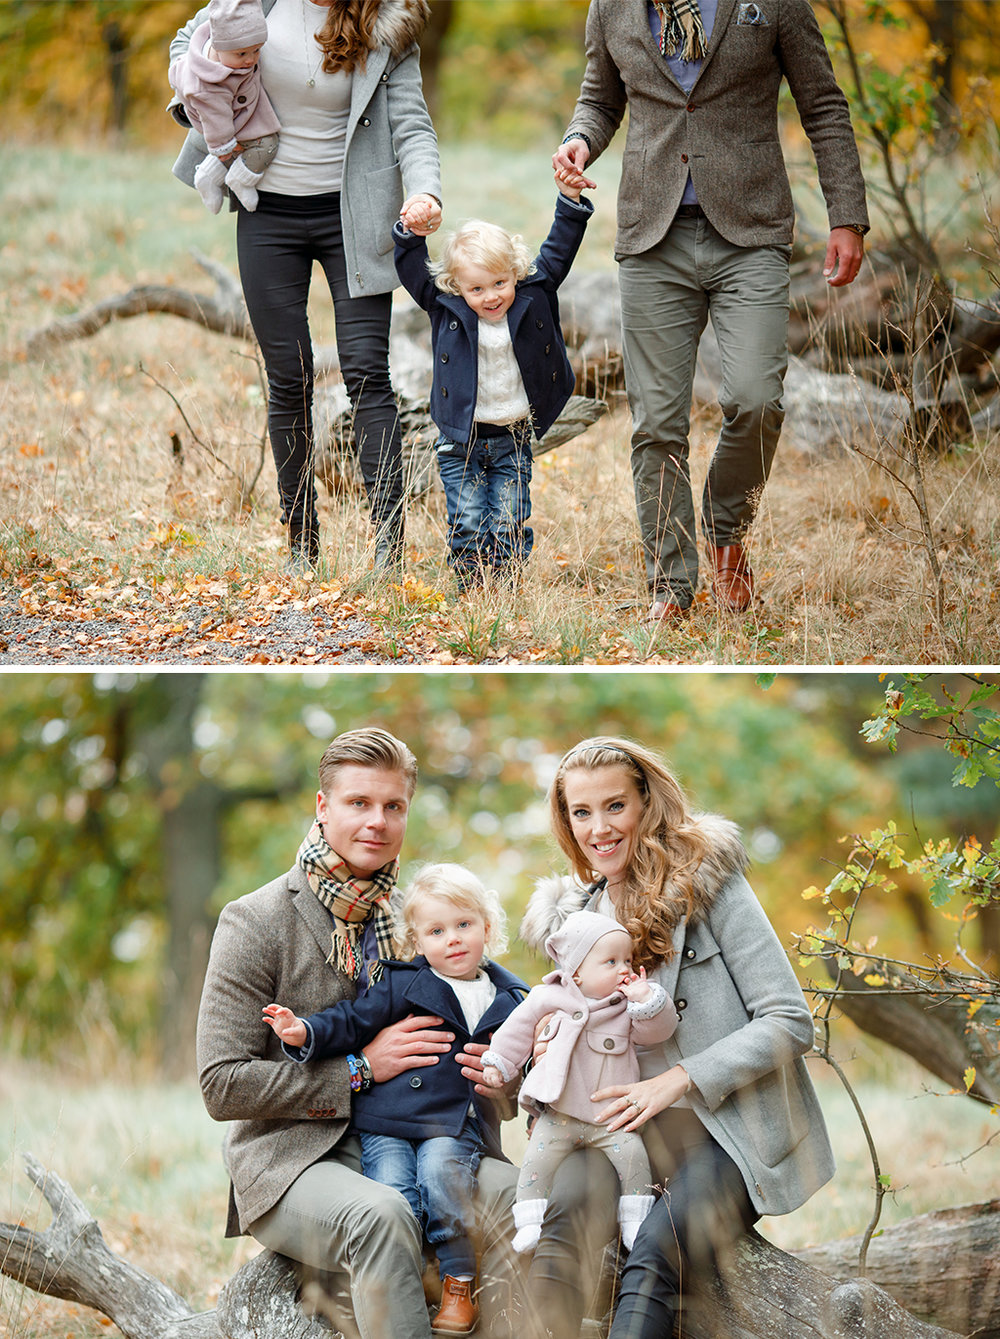 Familjefotografering_Hostfotografering_Familjefotograf-Stockholm_1.jpg